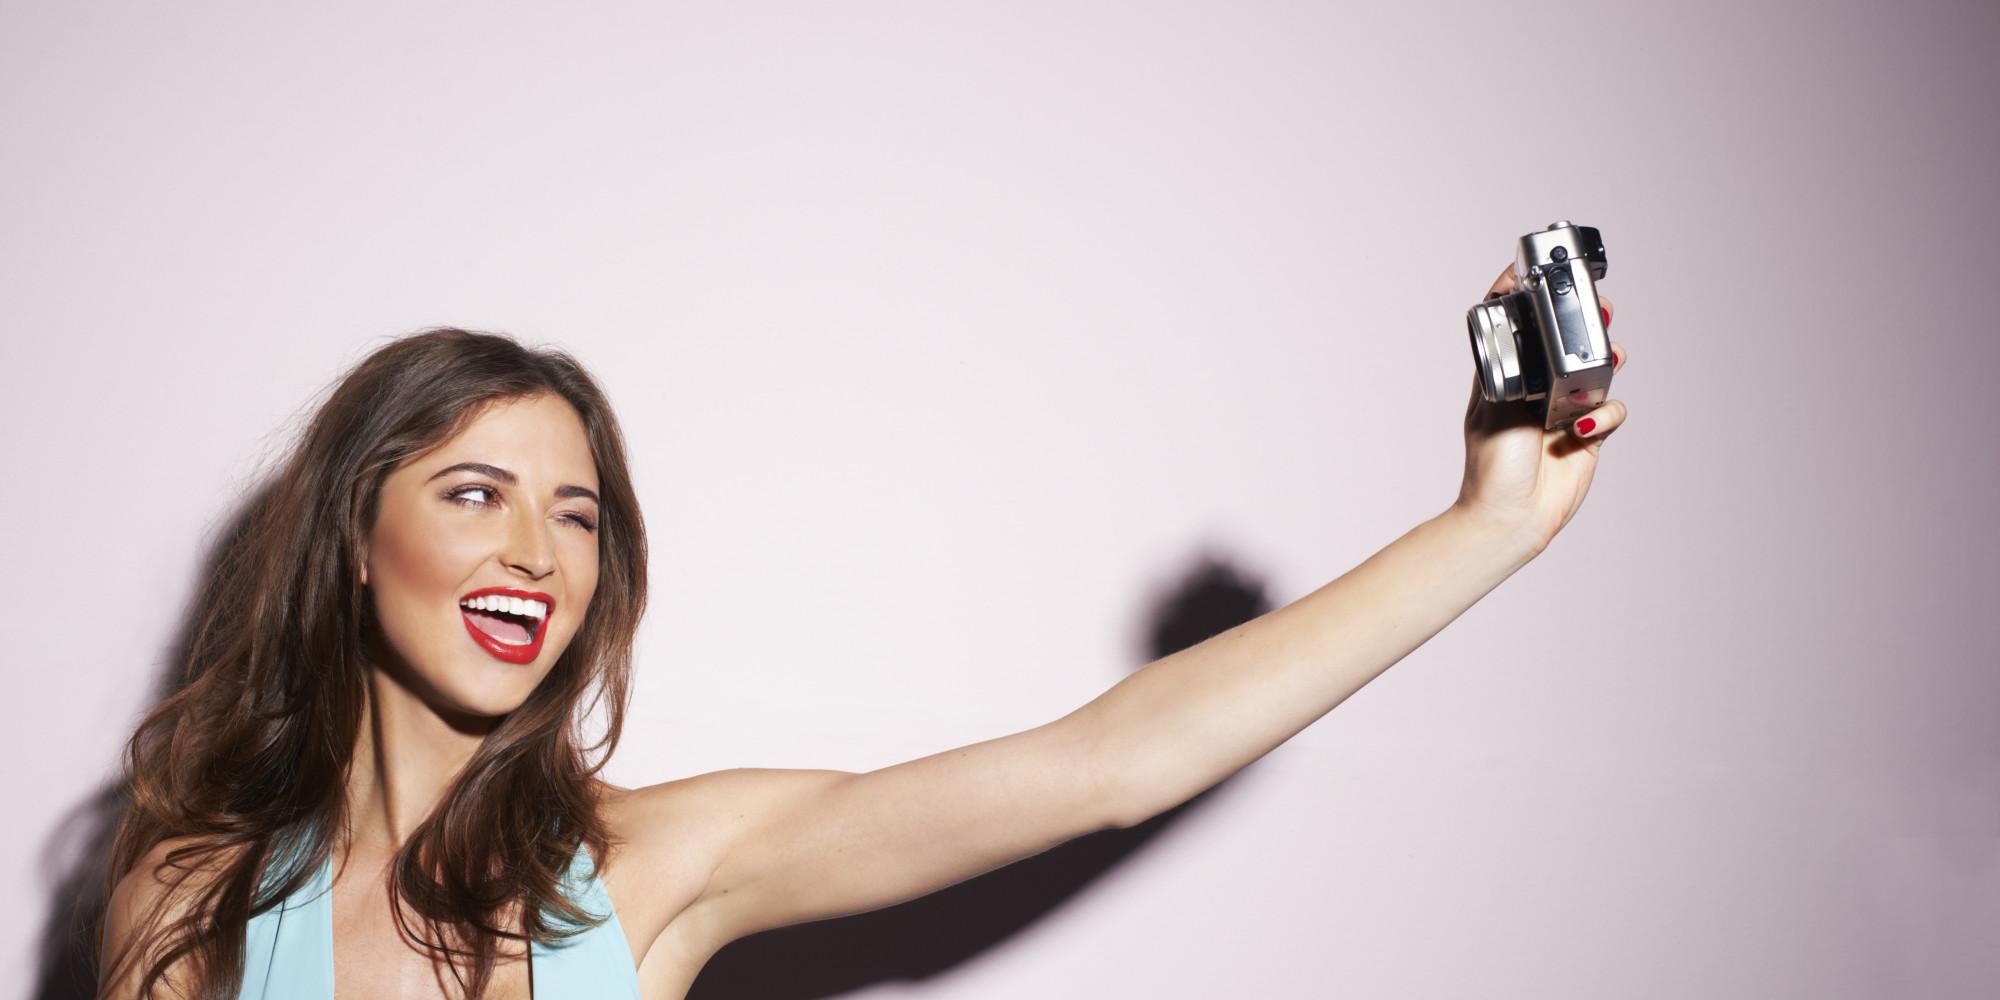 Muore per colpa di un selfie